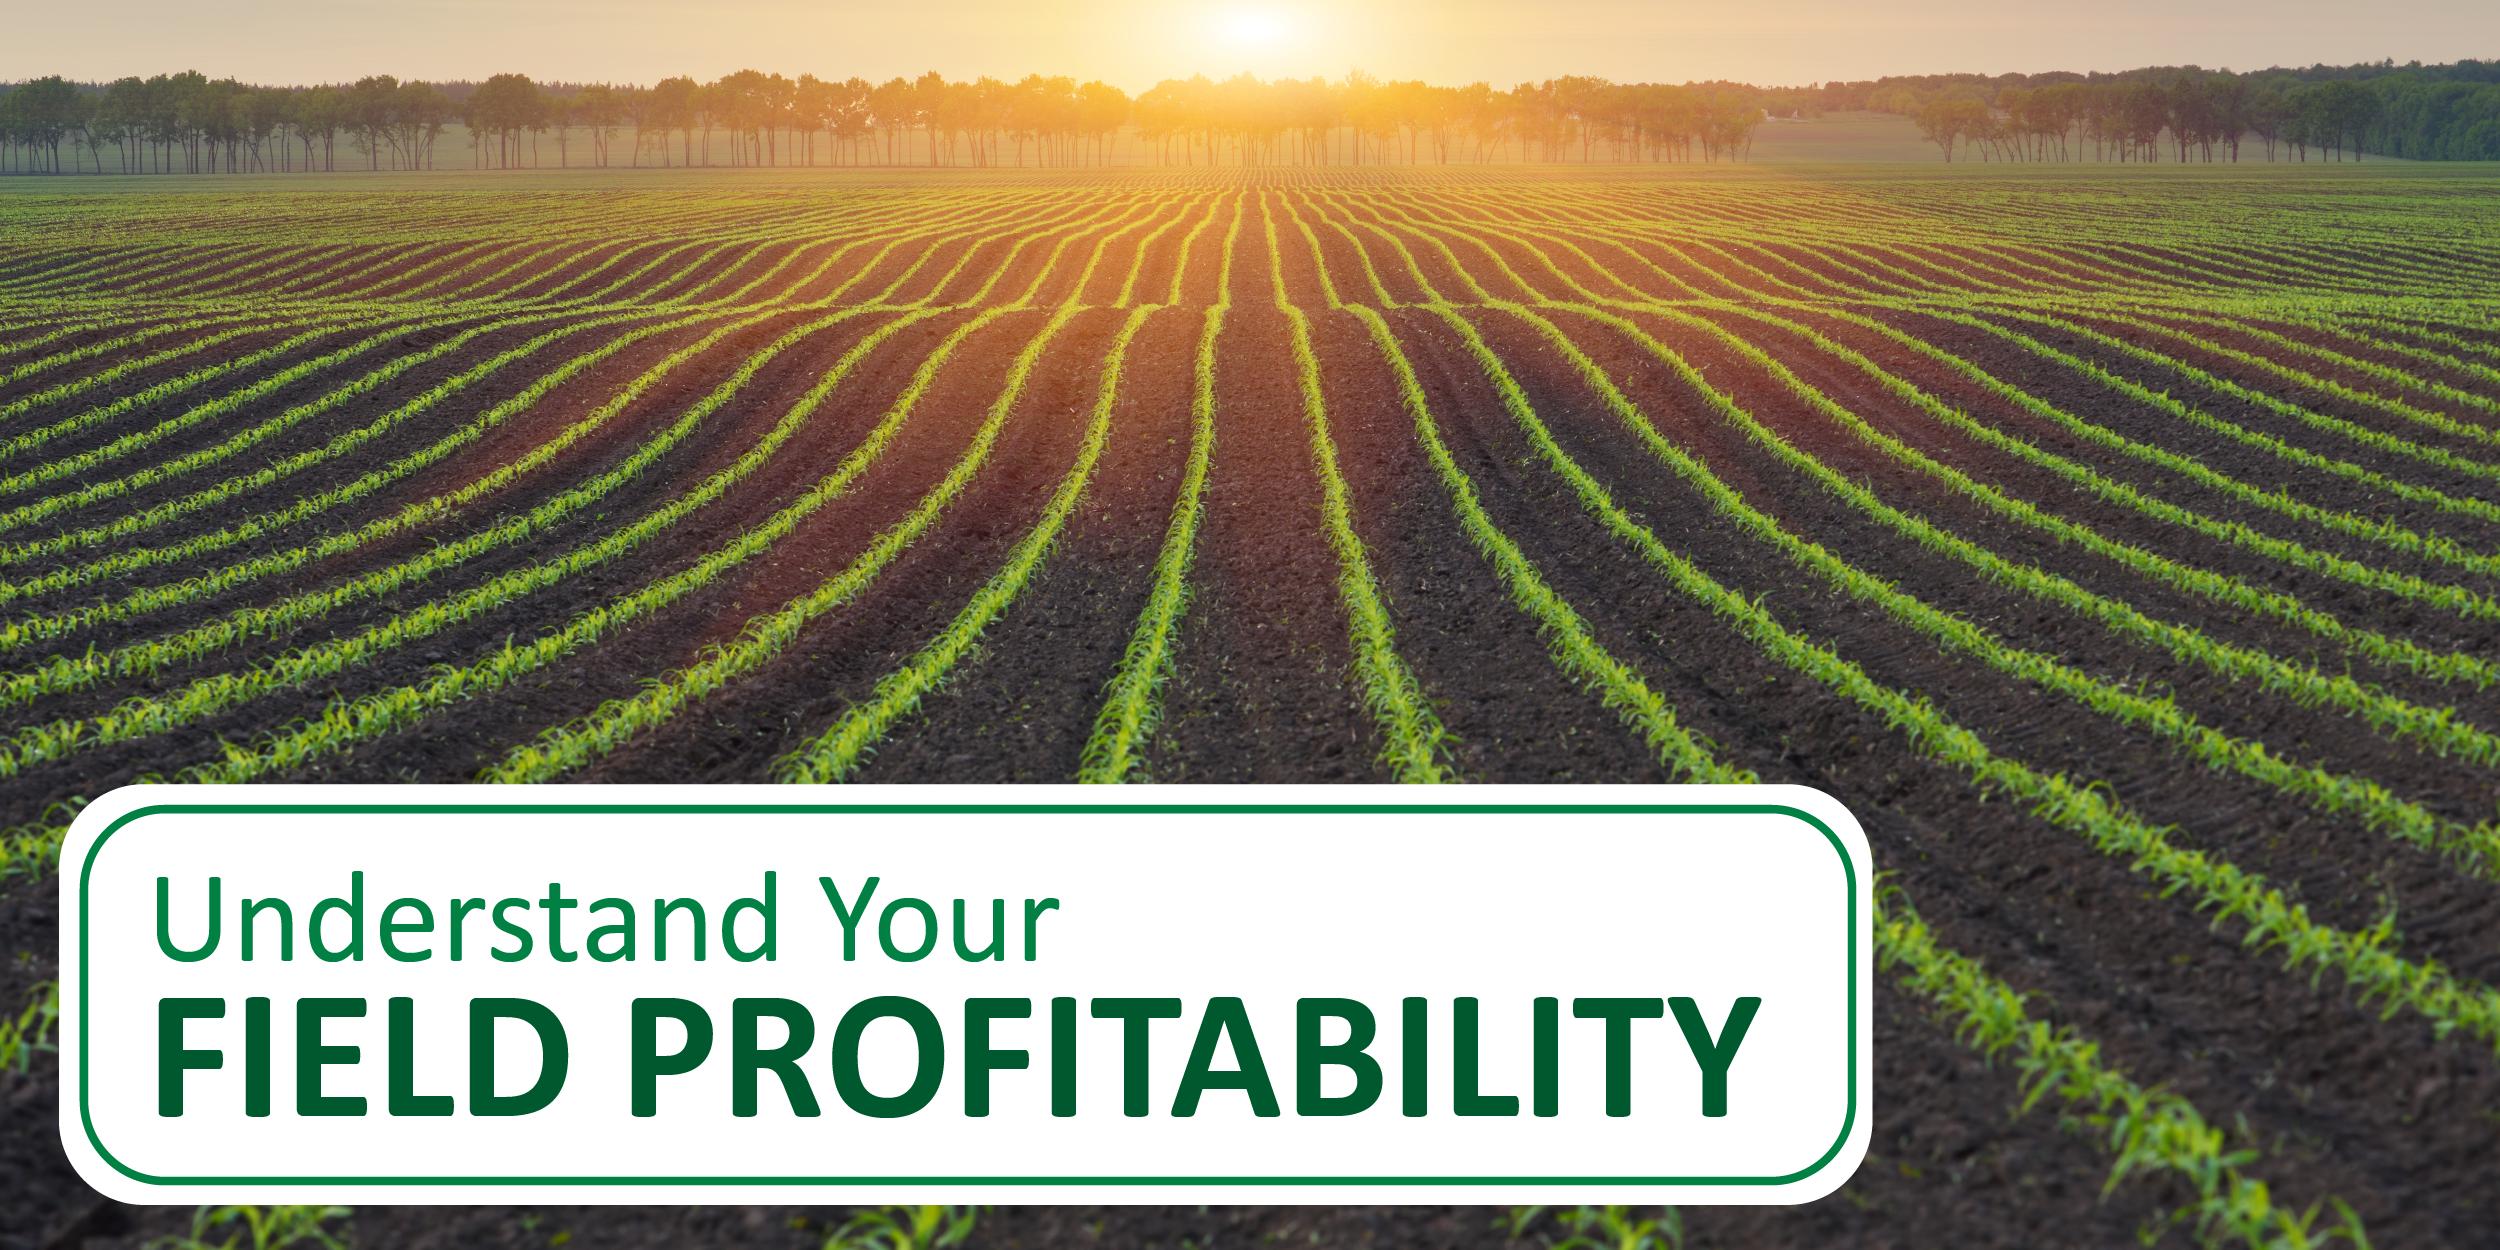 Understand Your Field Profitability